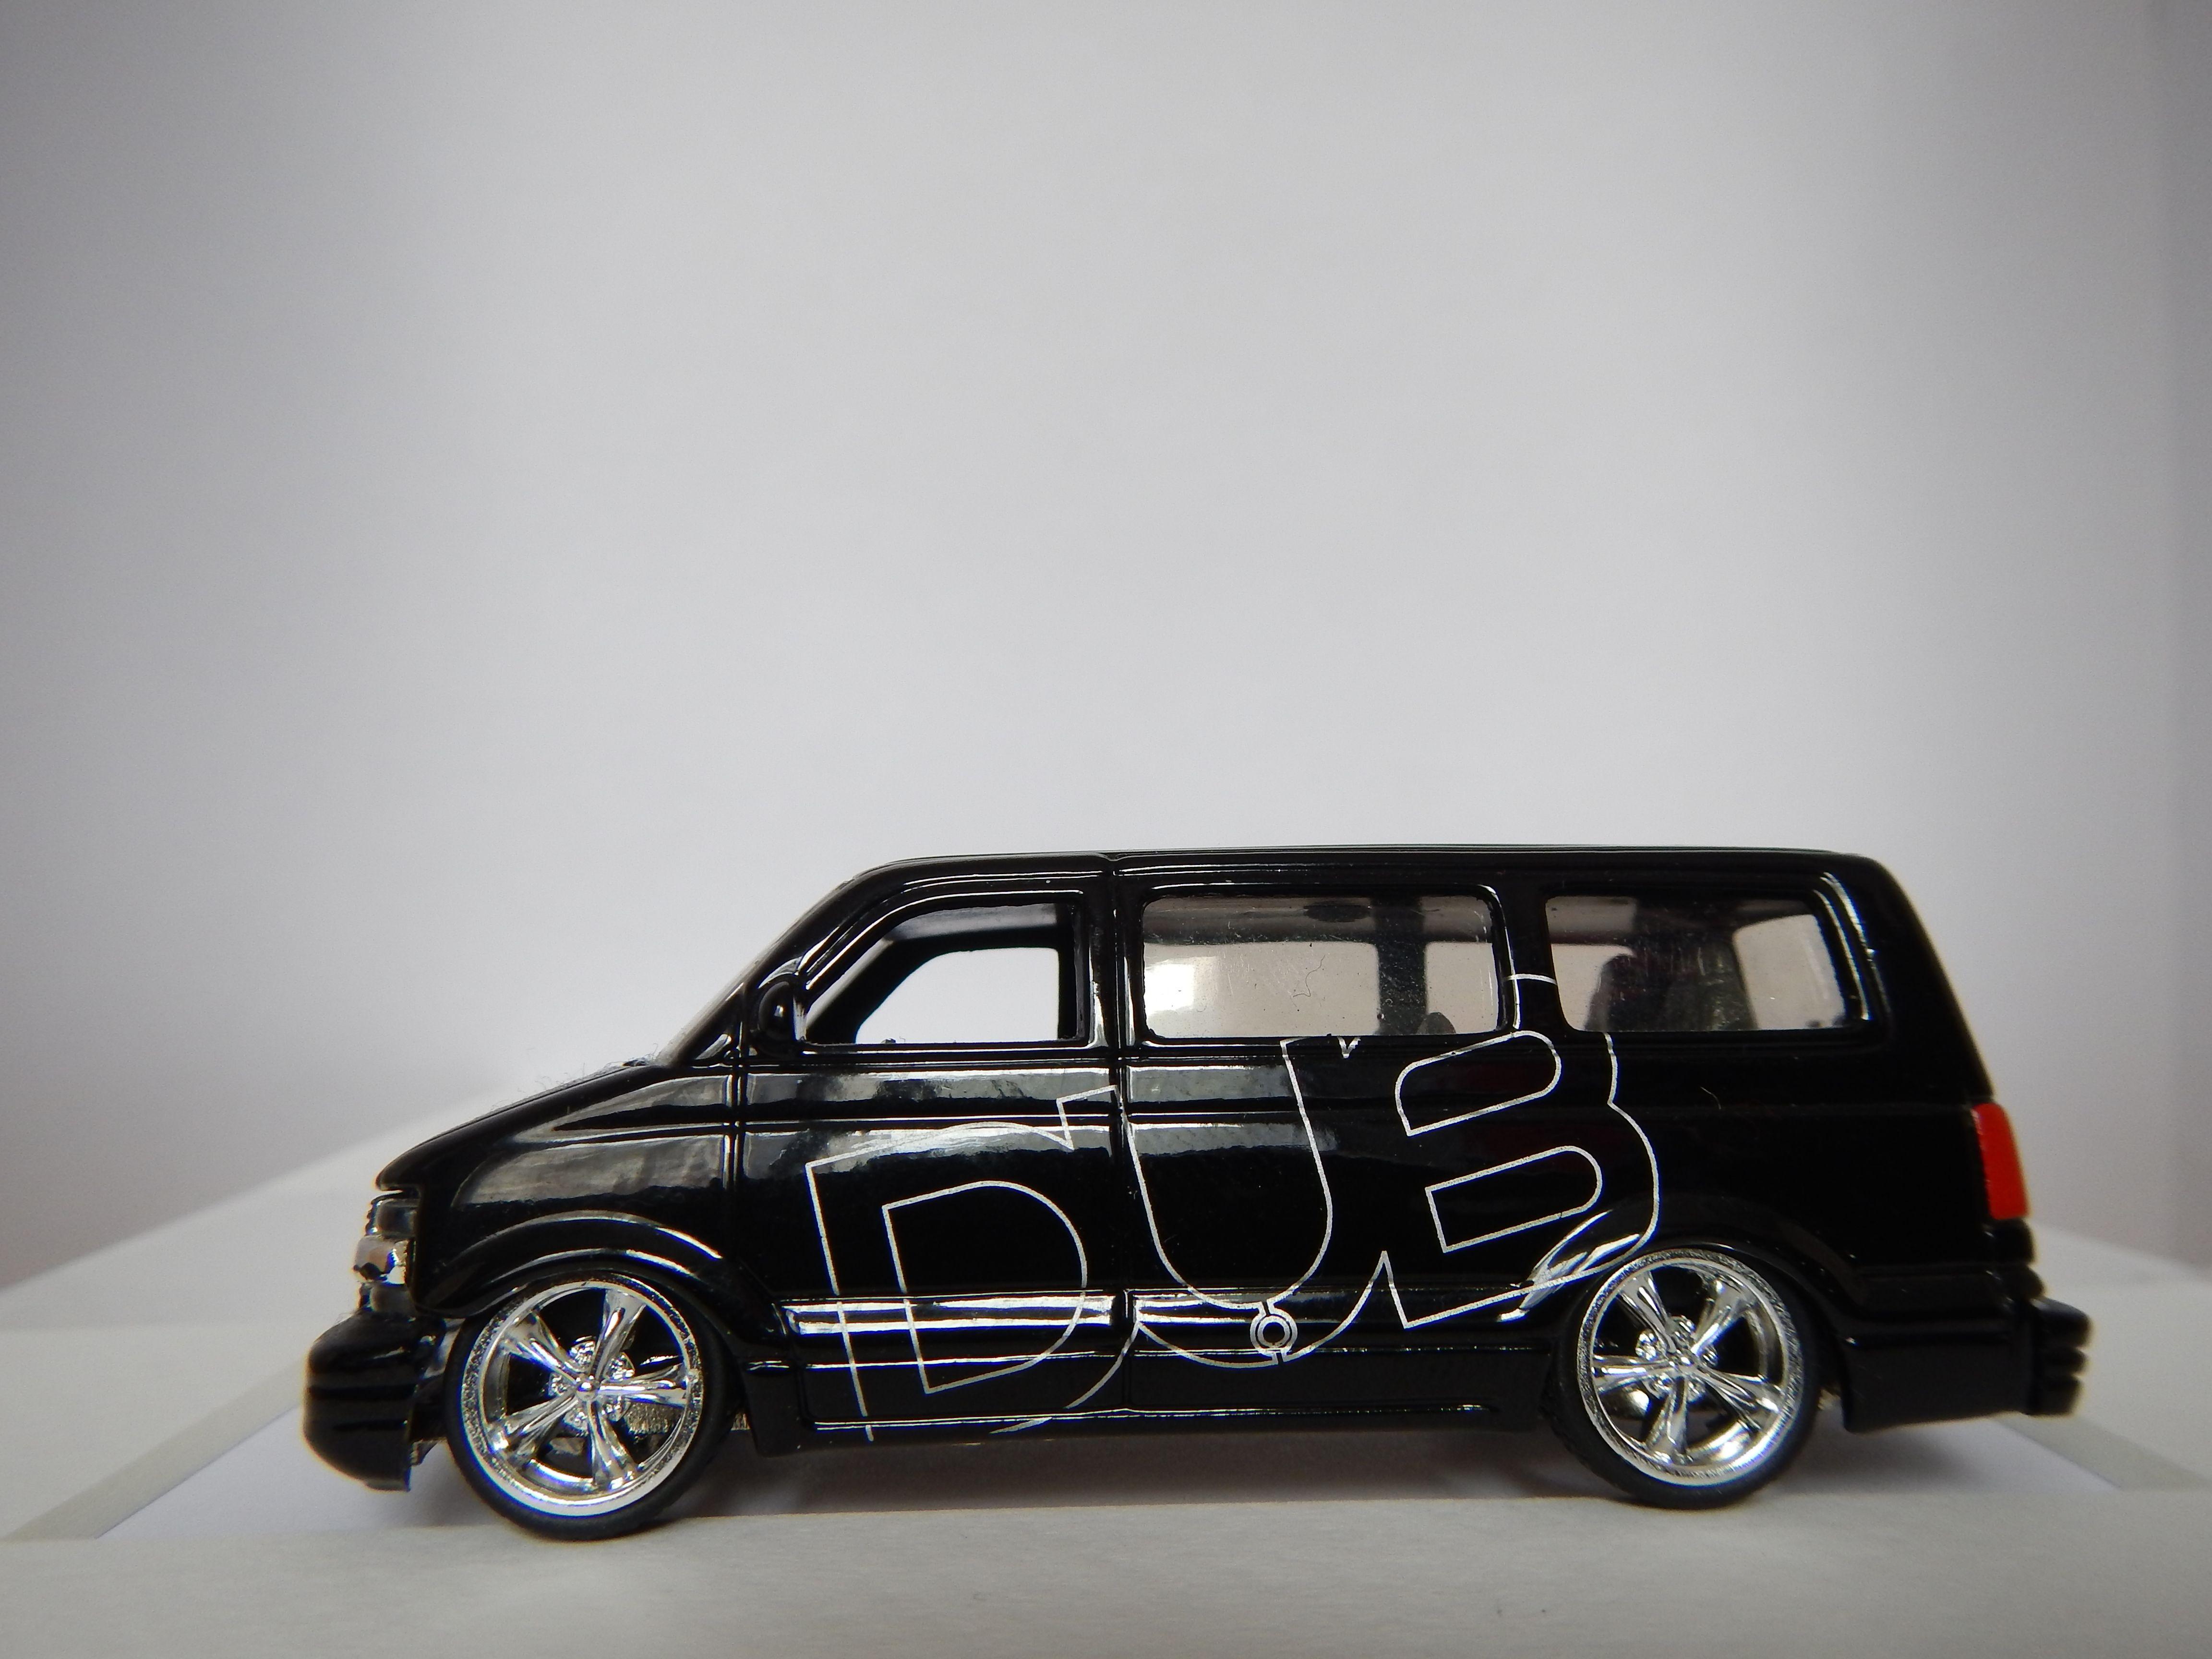 2001 chevrolet astro van by jada toys china  [ 4608 x 3456 Pixel ]